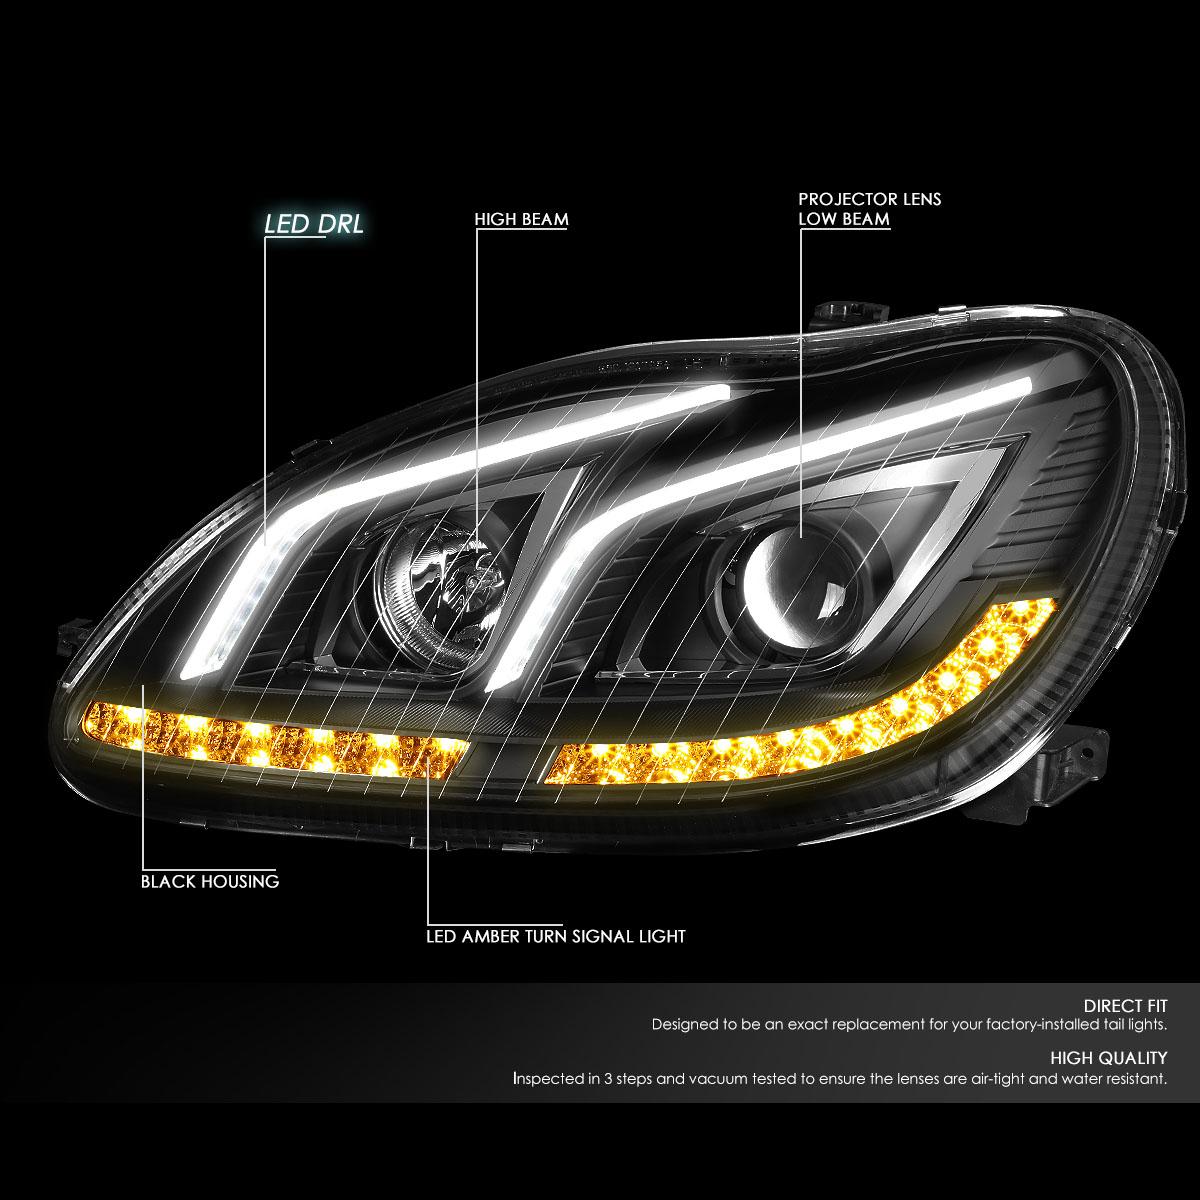 hight resolution of for 2000 to 2006 mercedes s class w220 led drl light bar amber turn signal projector headlight black housing headlamp 01 02 03 04 05 s65 amg walmart com